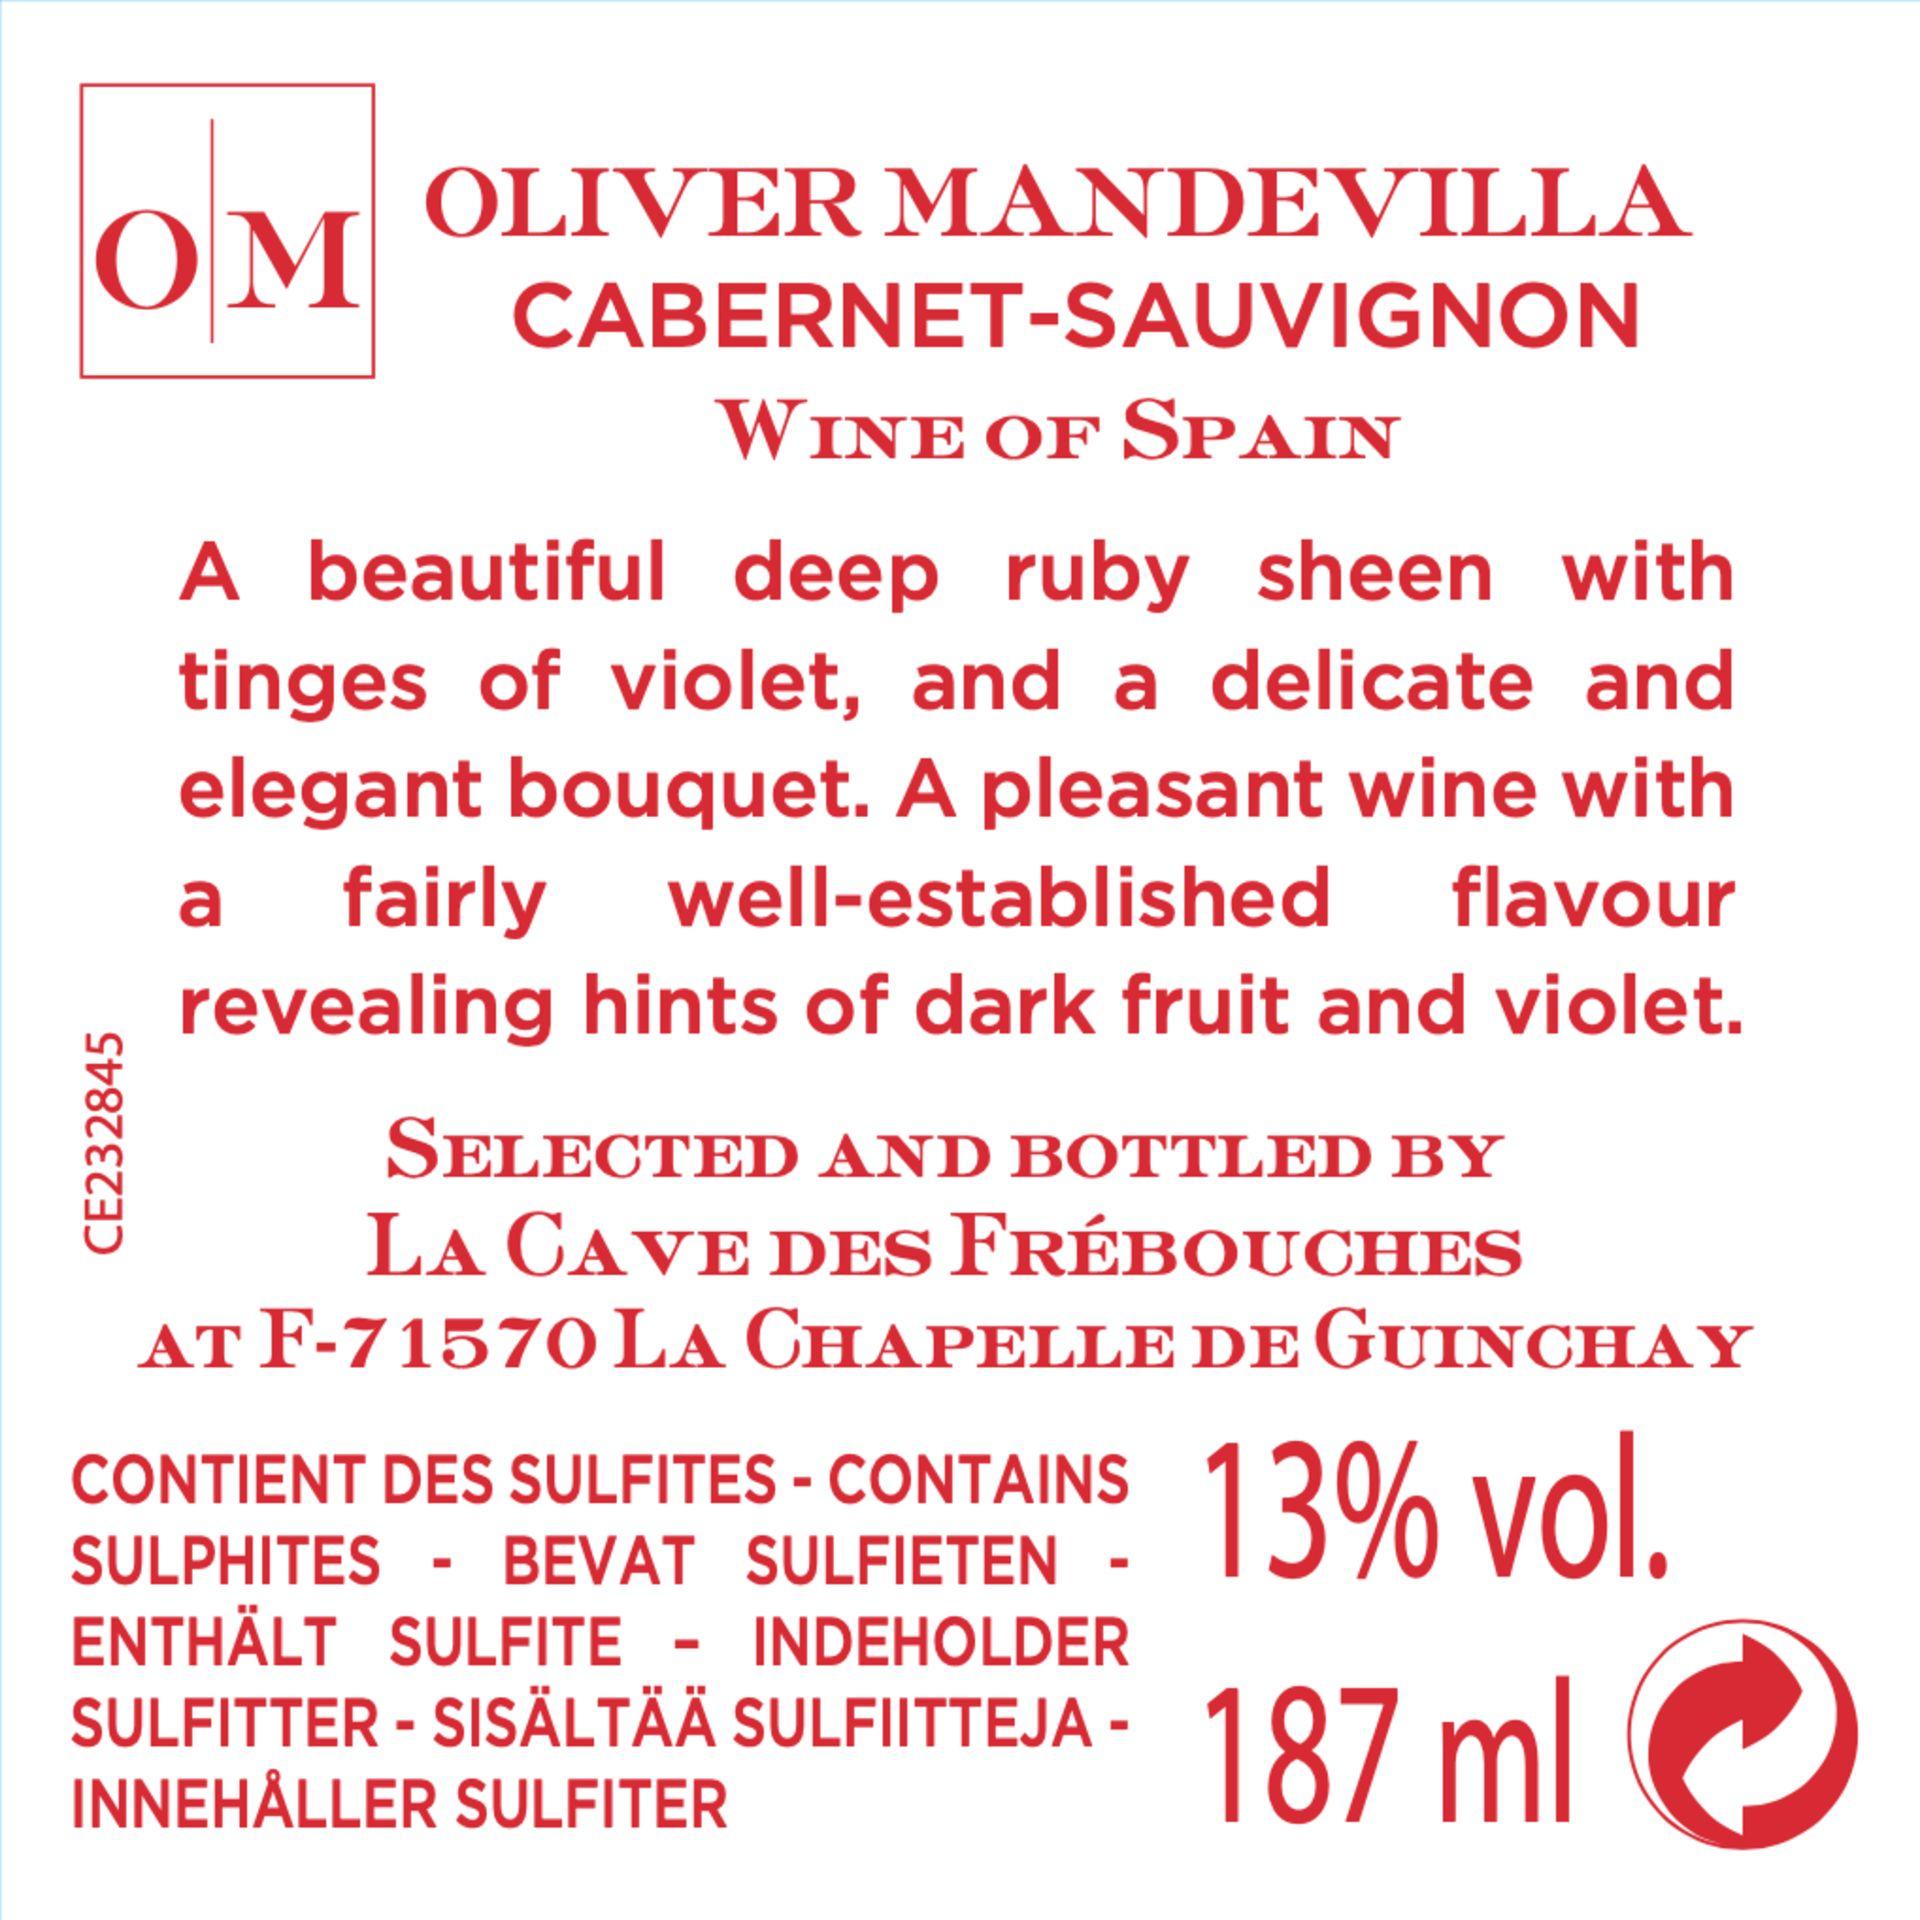 1 x Pallet of Oliver Mandevilla Cabernet-Sauvignon - Image 3 of 4